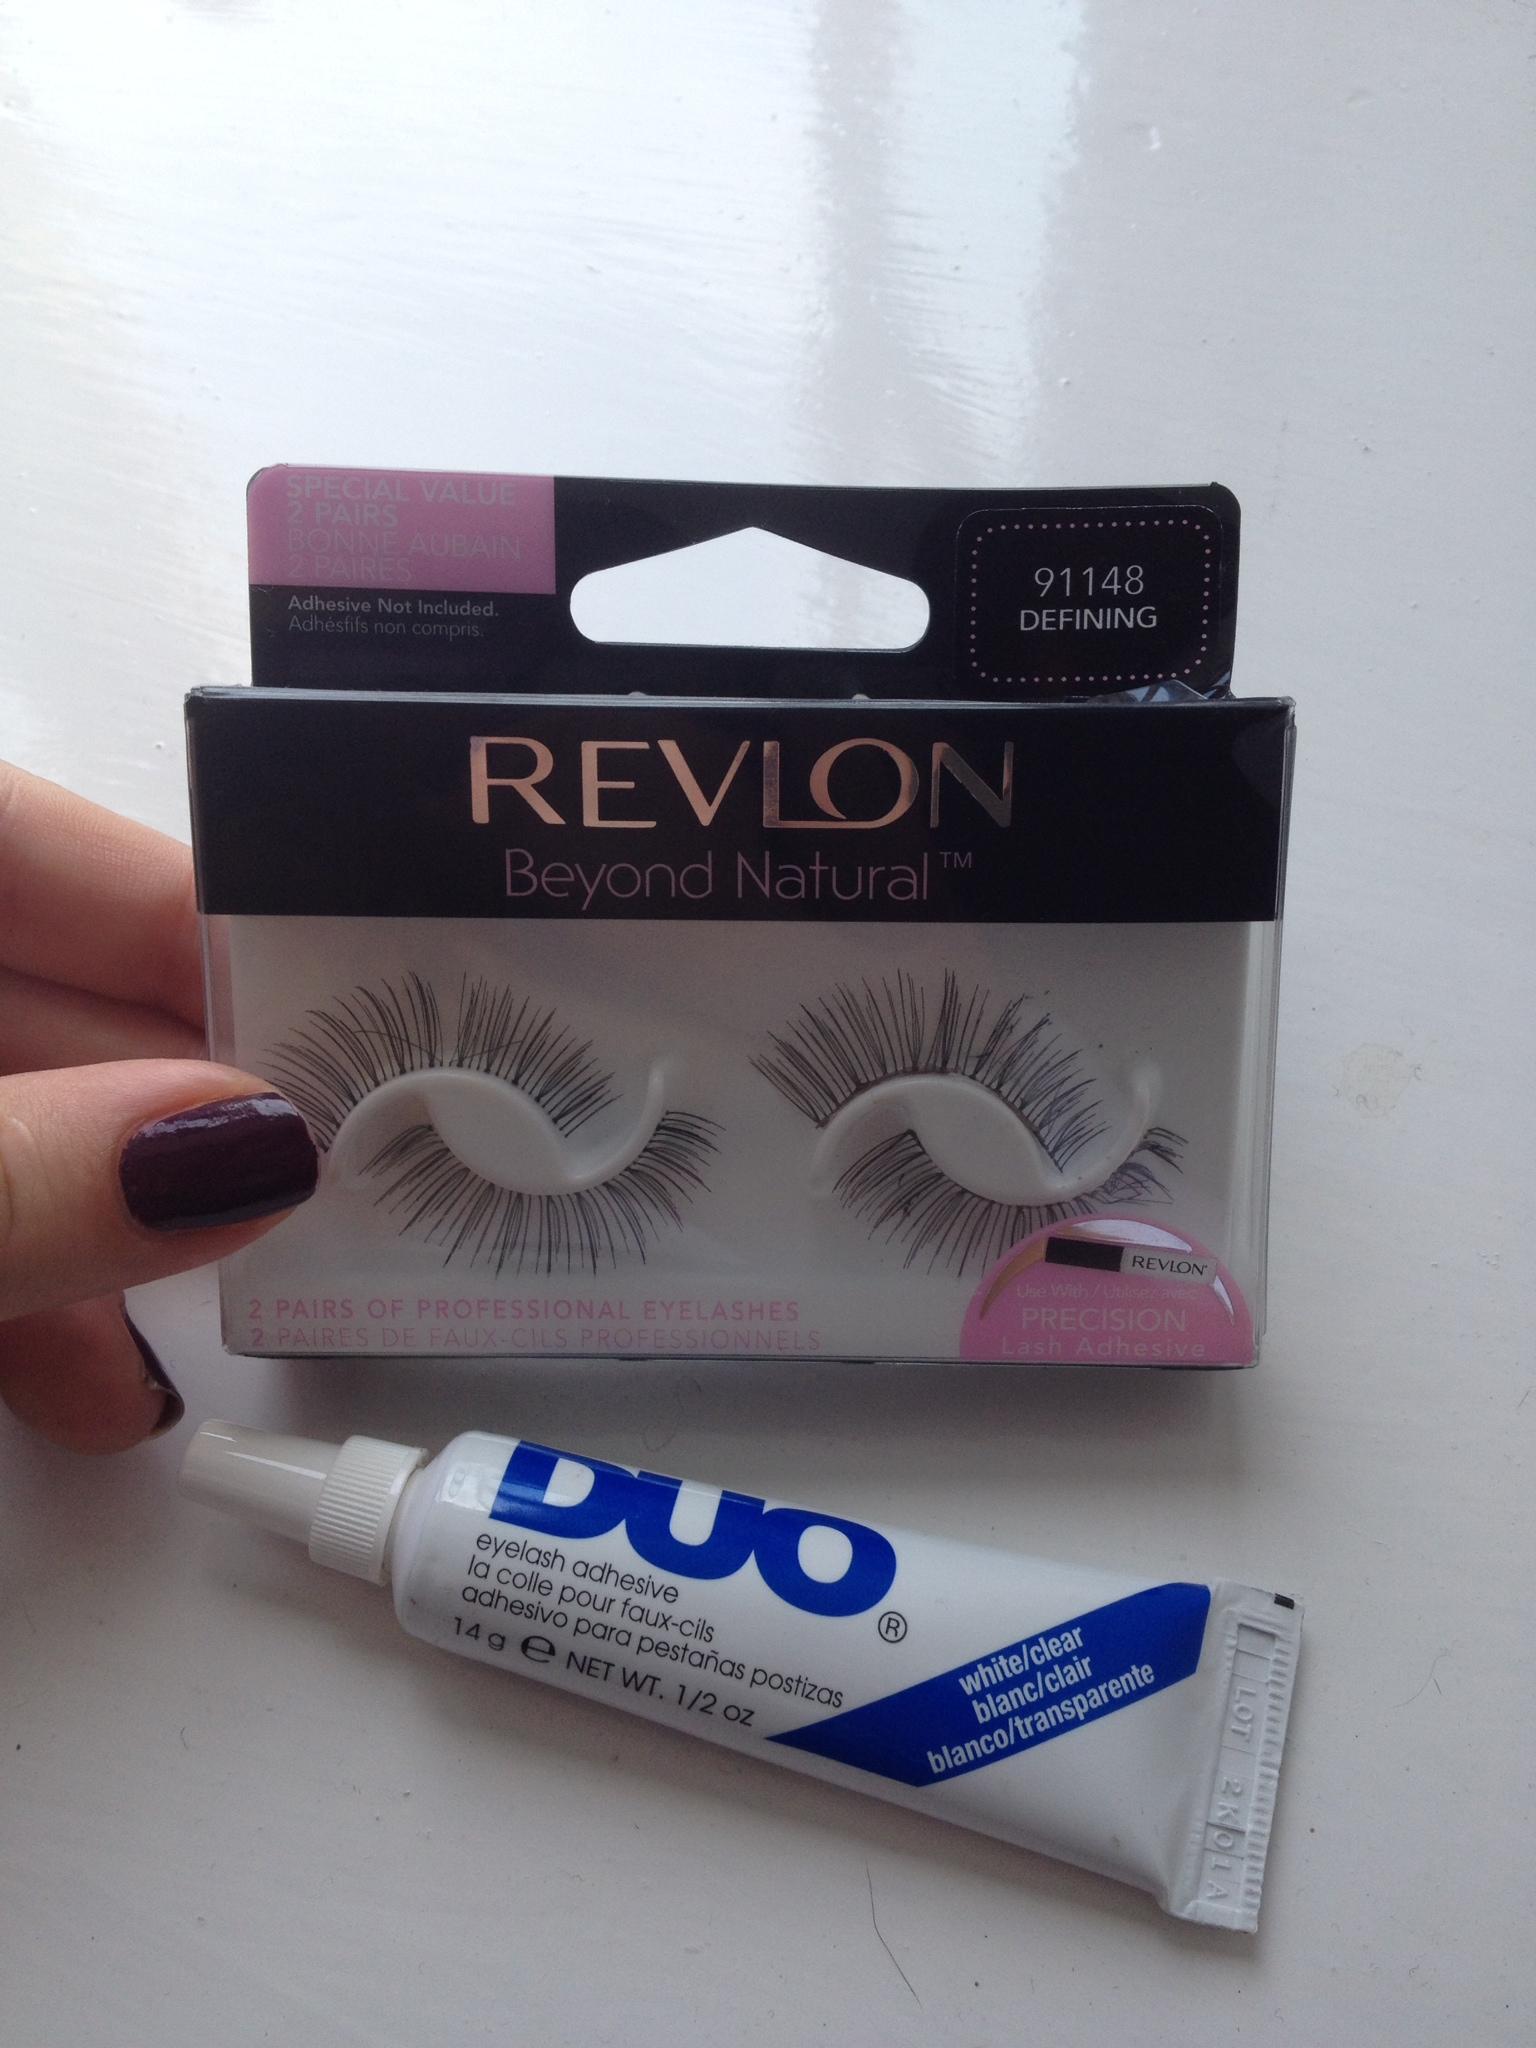 Revlon Beyond Naturals Defining False Lashes Review The Cornish Girl